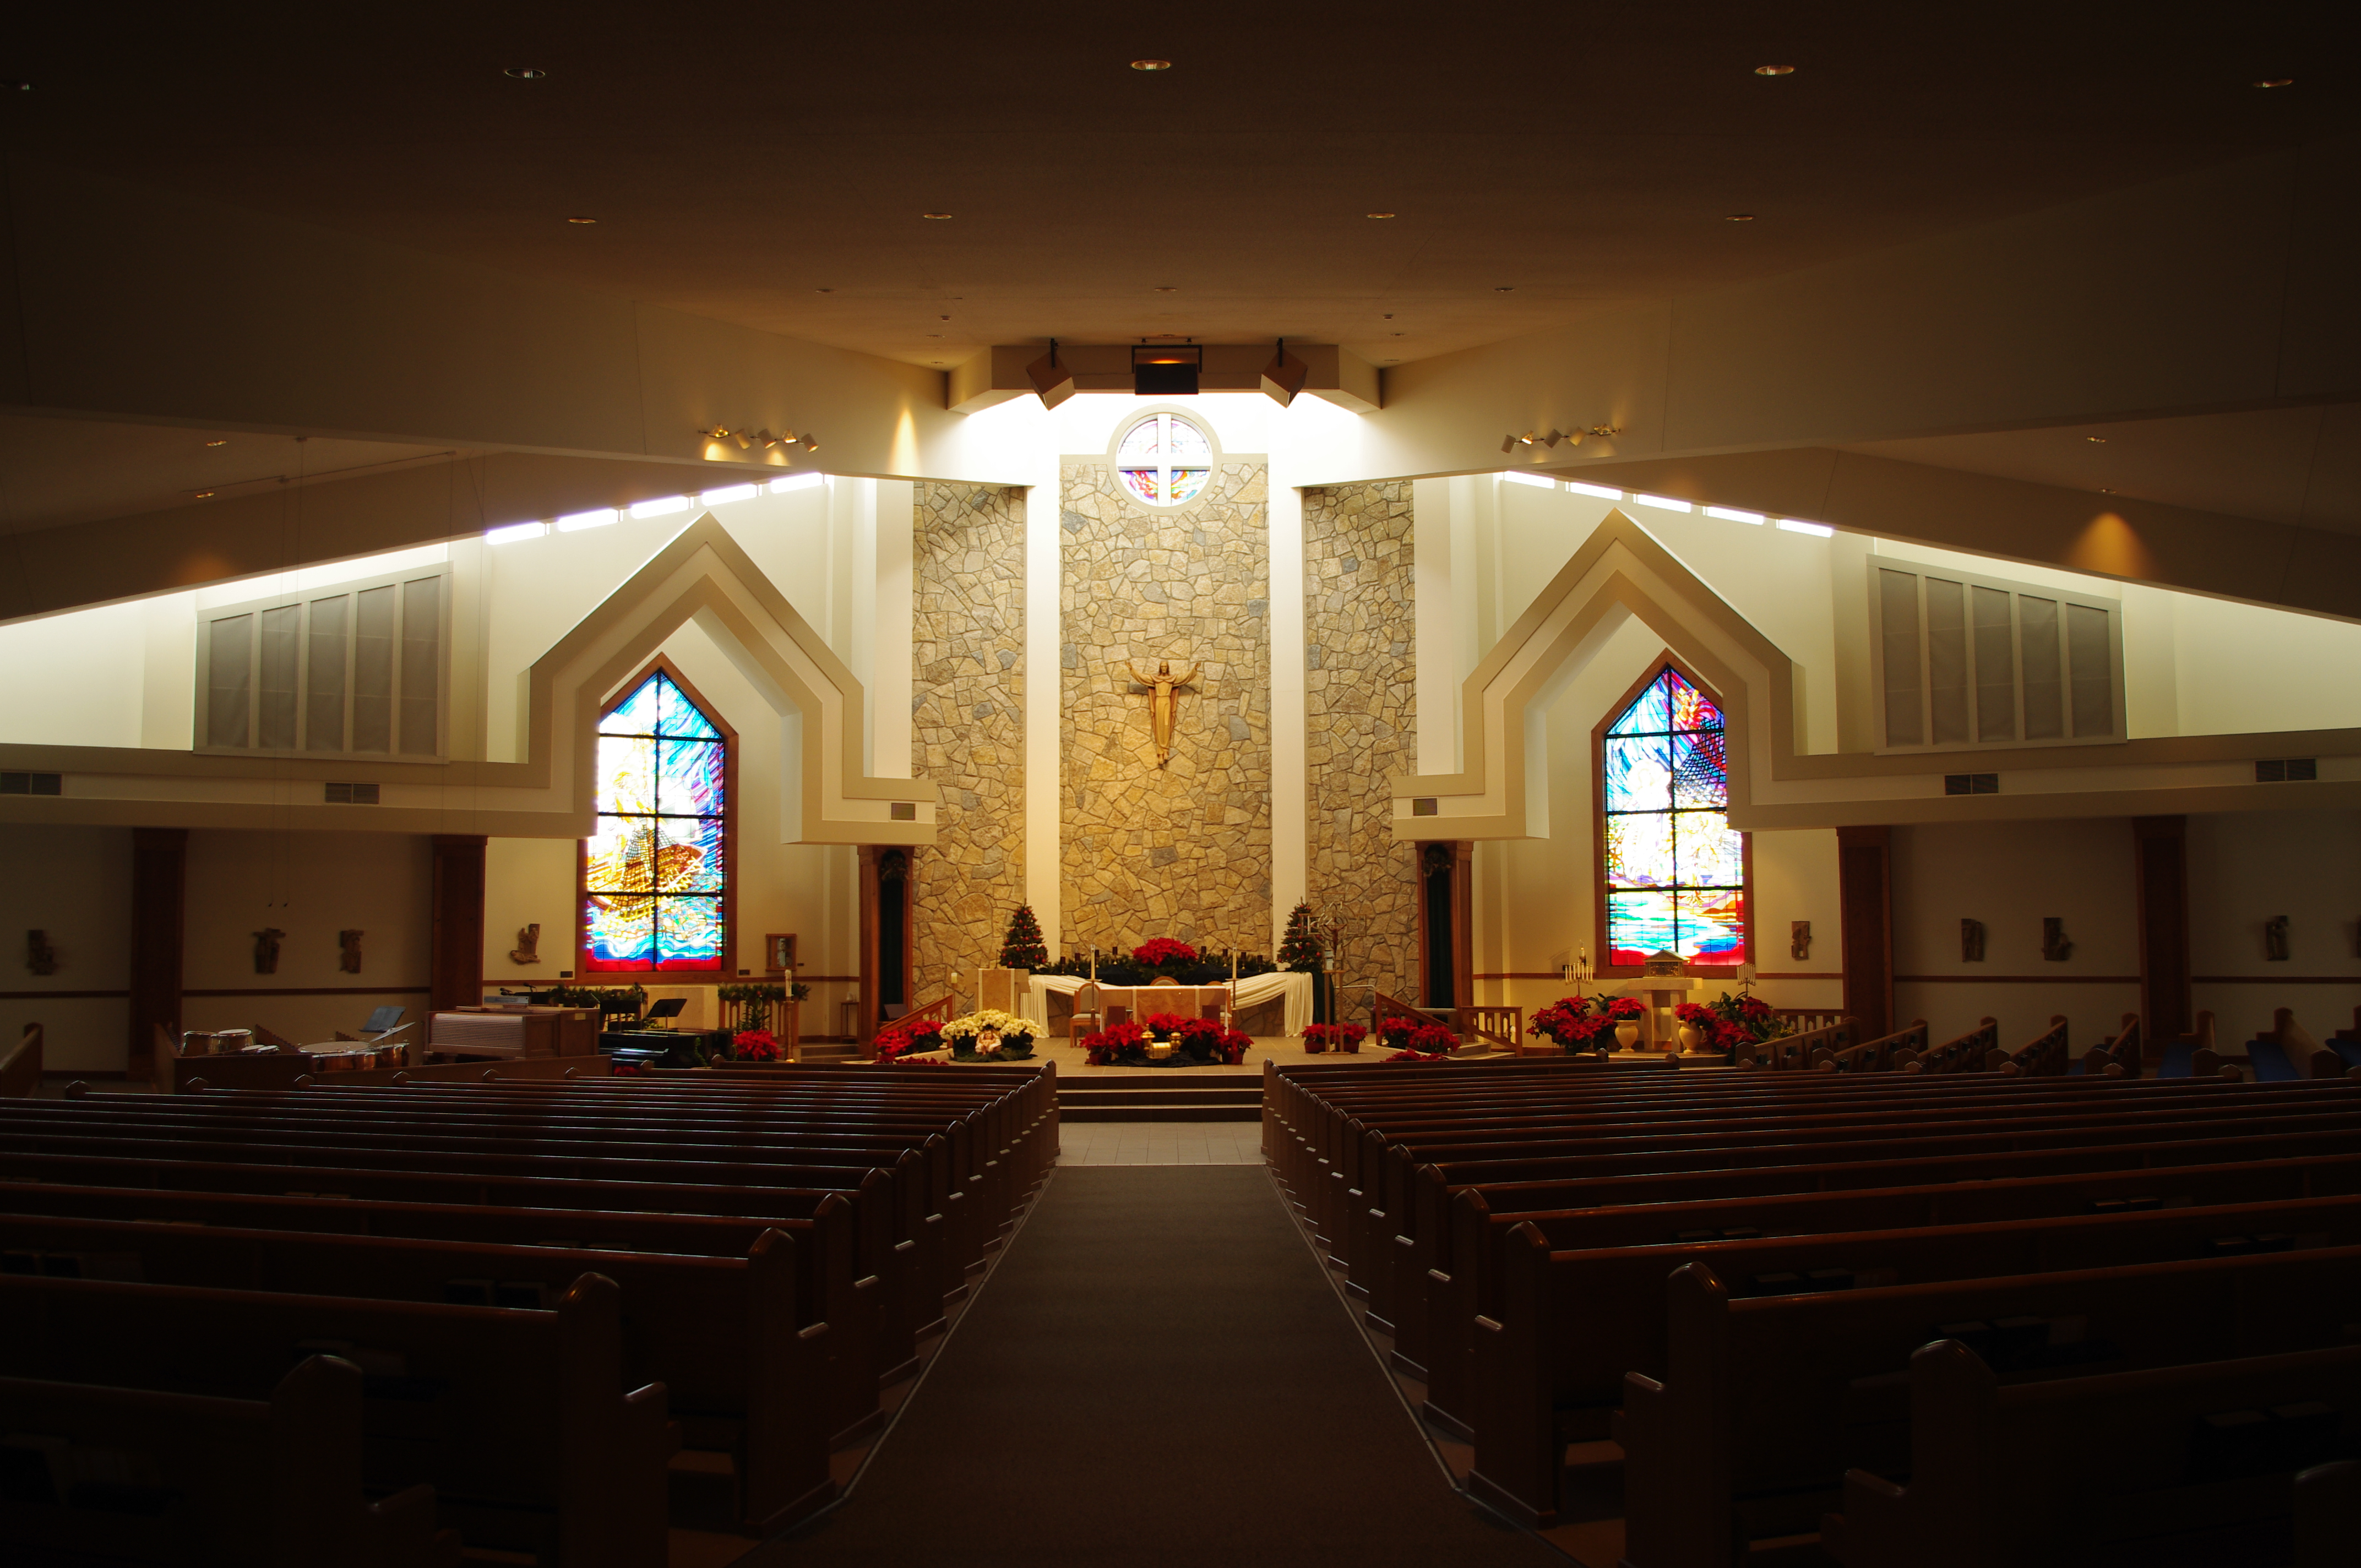 File:Saint_Peter_Catholic_Church_(Columbus,_Ohio)_ _interior,_decorated_for_Christmas on Modern Church Interior